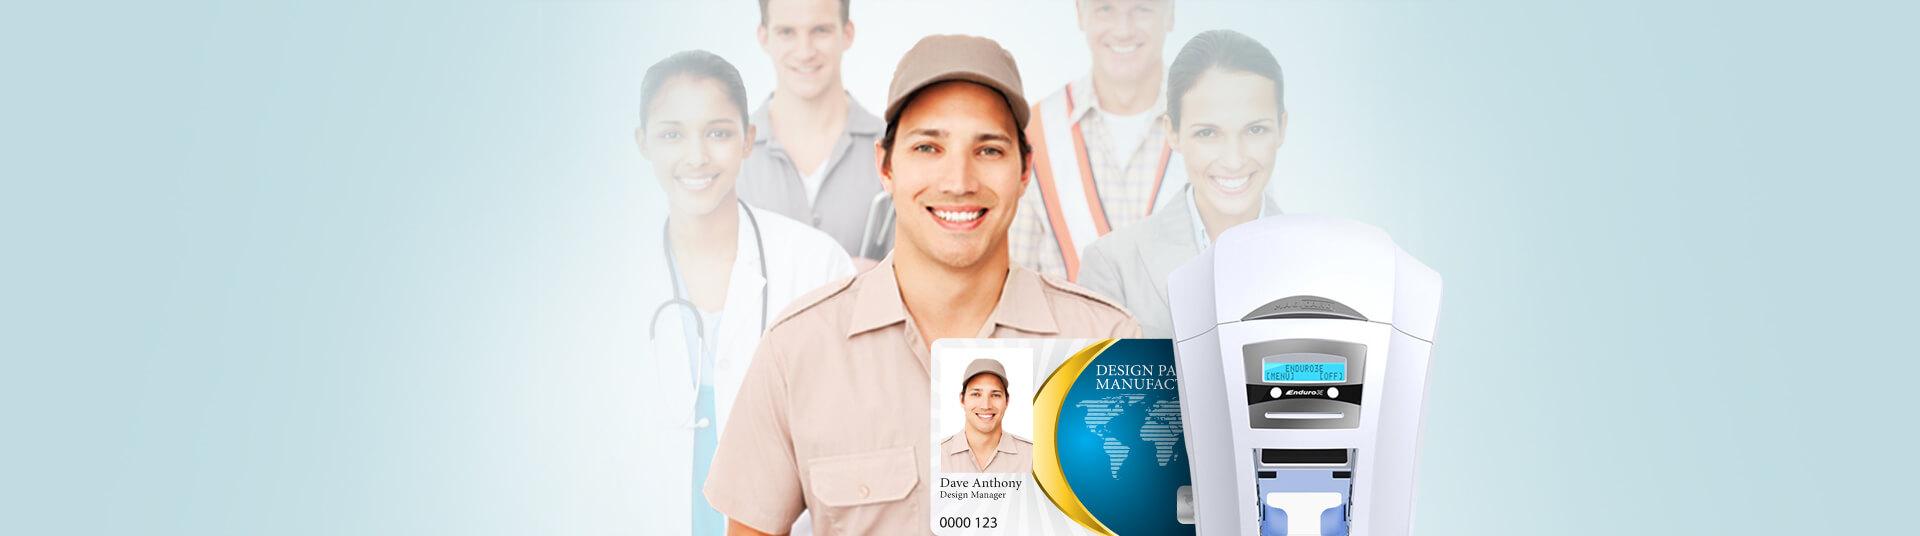 Hospital Visitor ID Badges